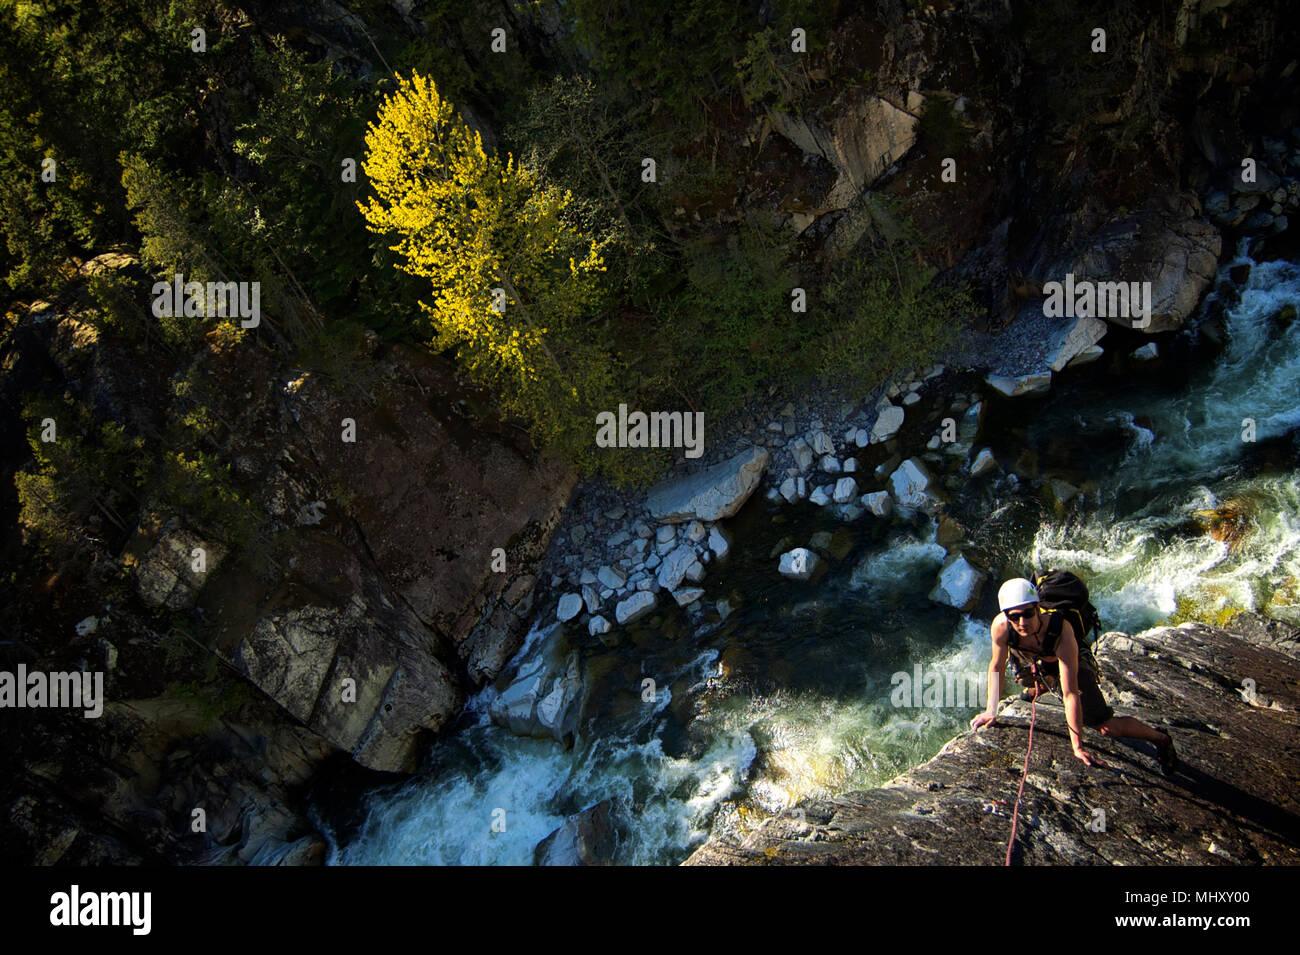 Man trad climbing at The Chief, Squamish, Canada - Stock Image